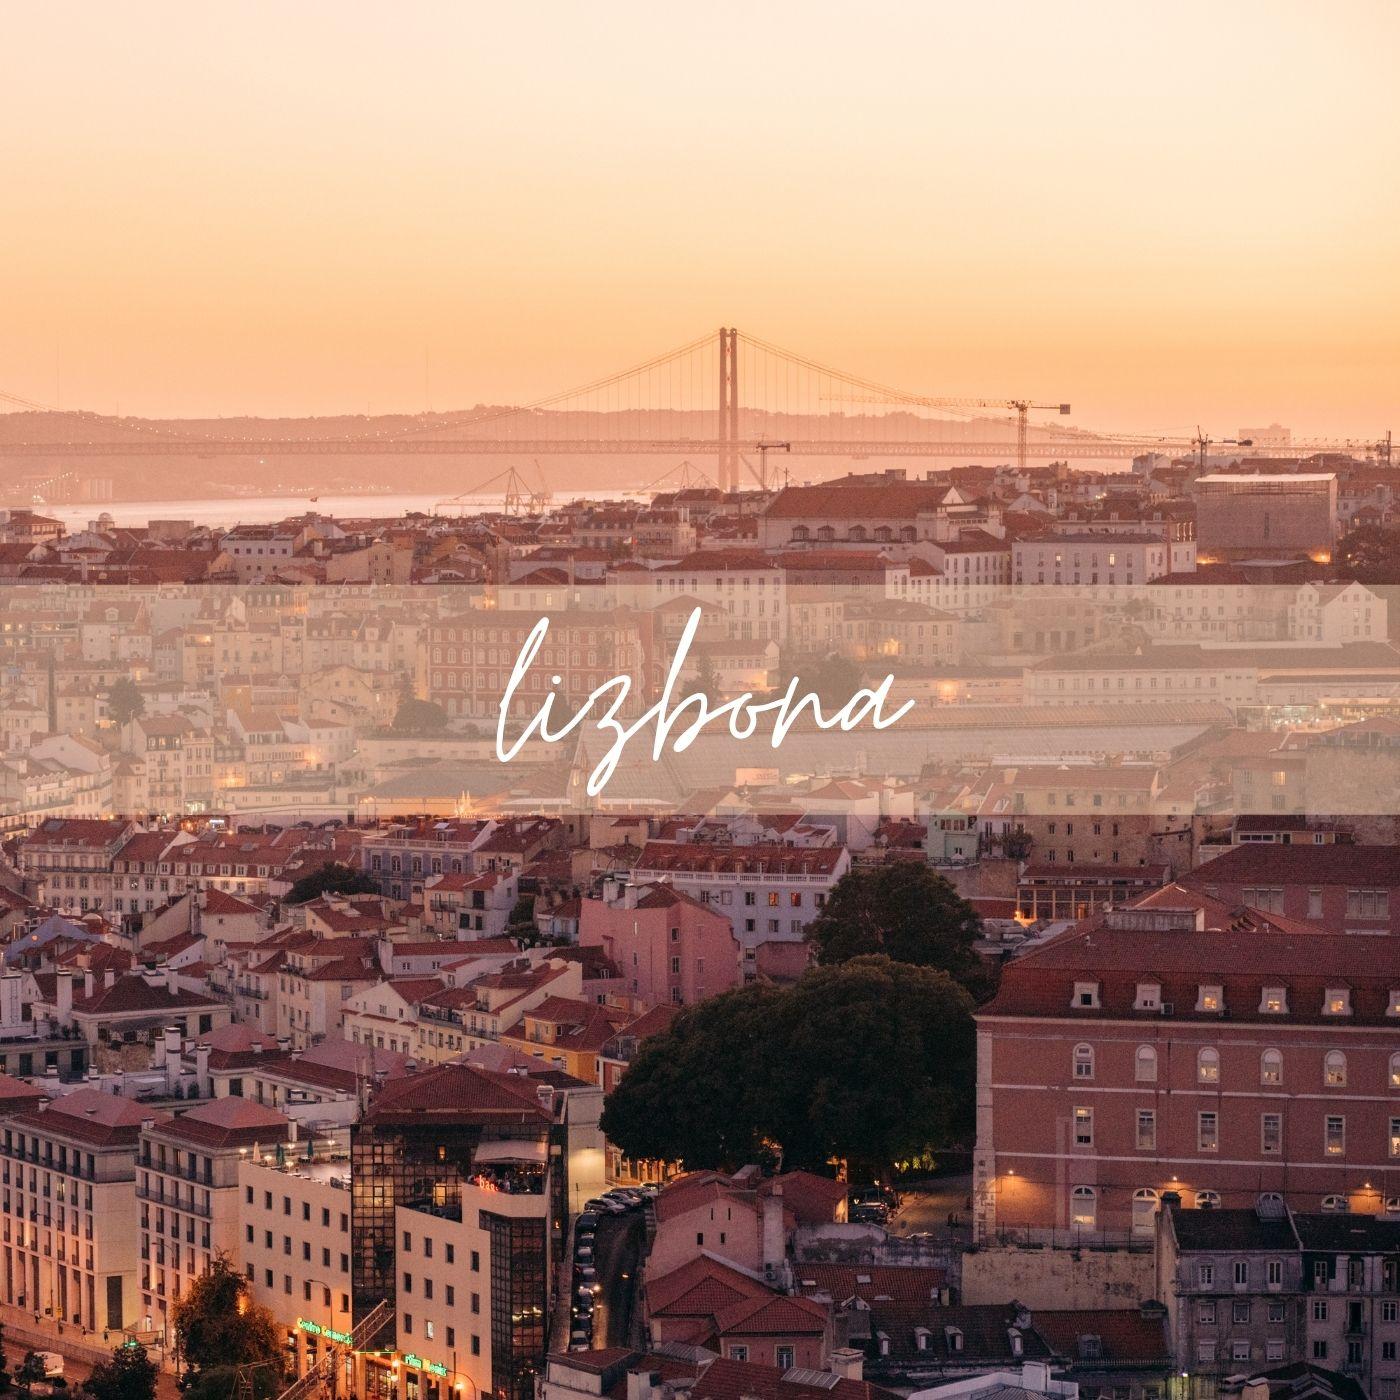 Presety do lightrooma lizbona - lostitalianos